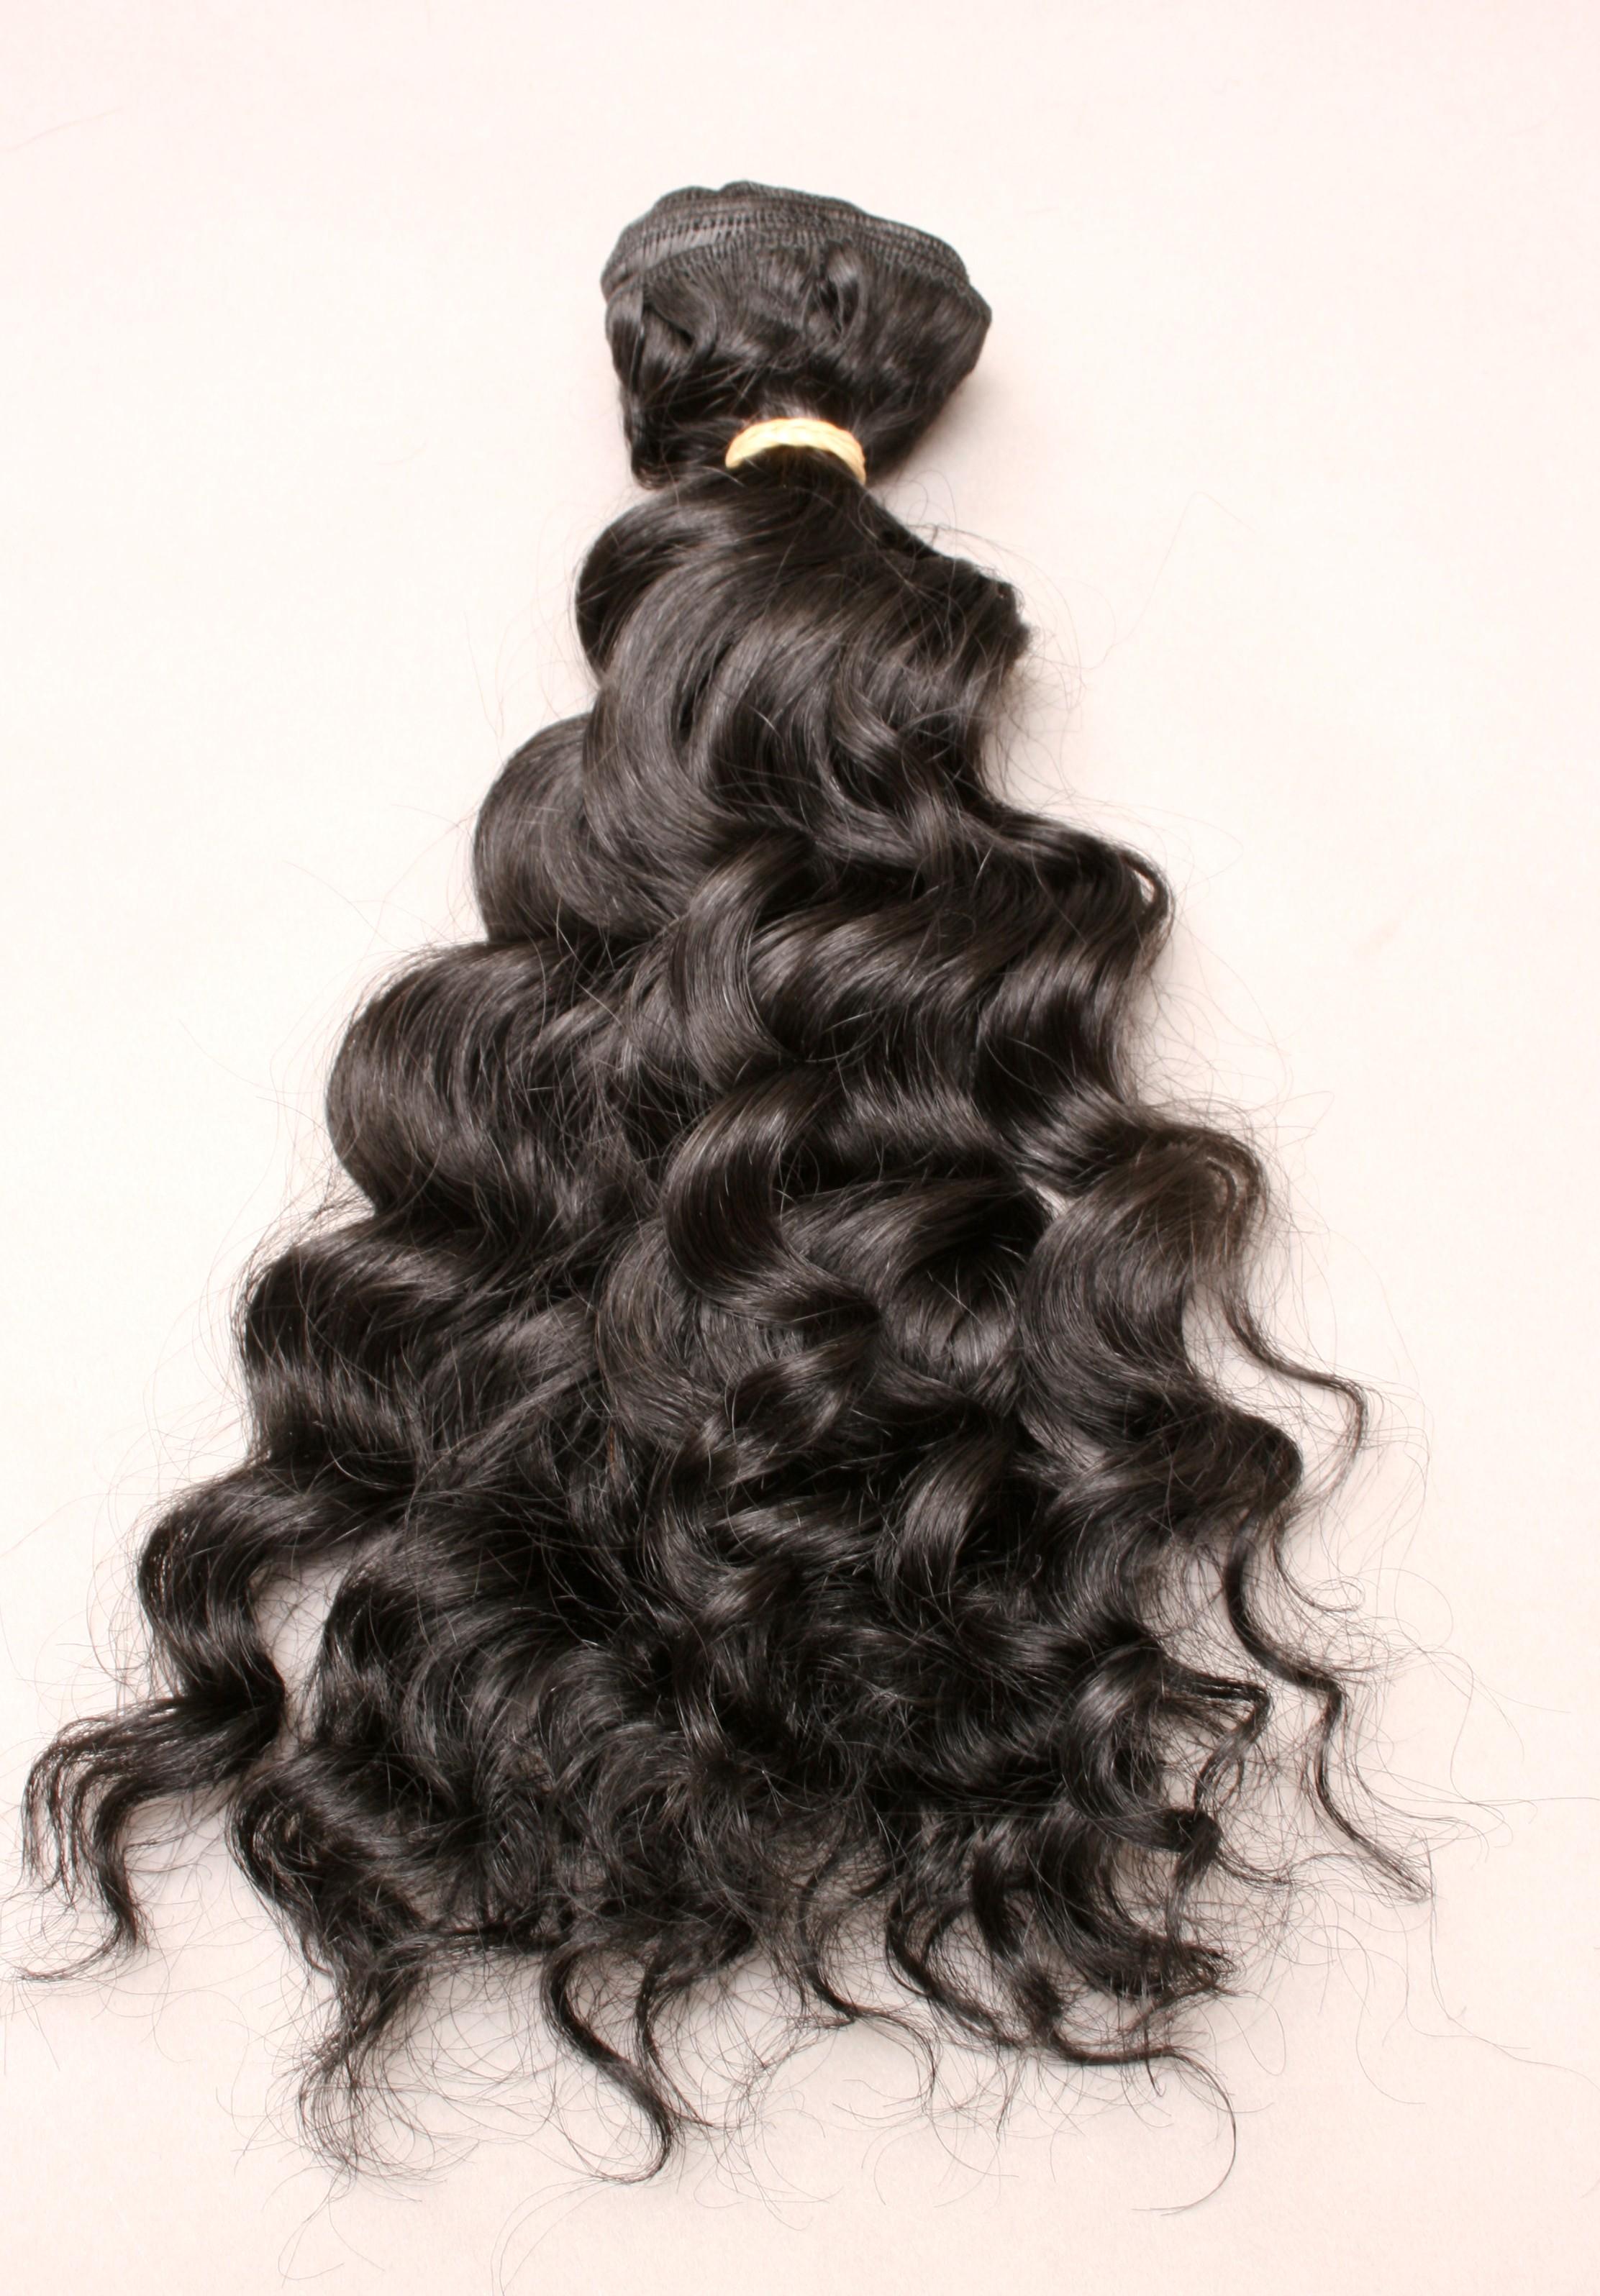 Indian Wavy Hair Samples, $10.00 : Femi Hair